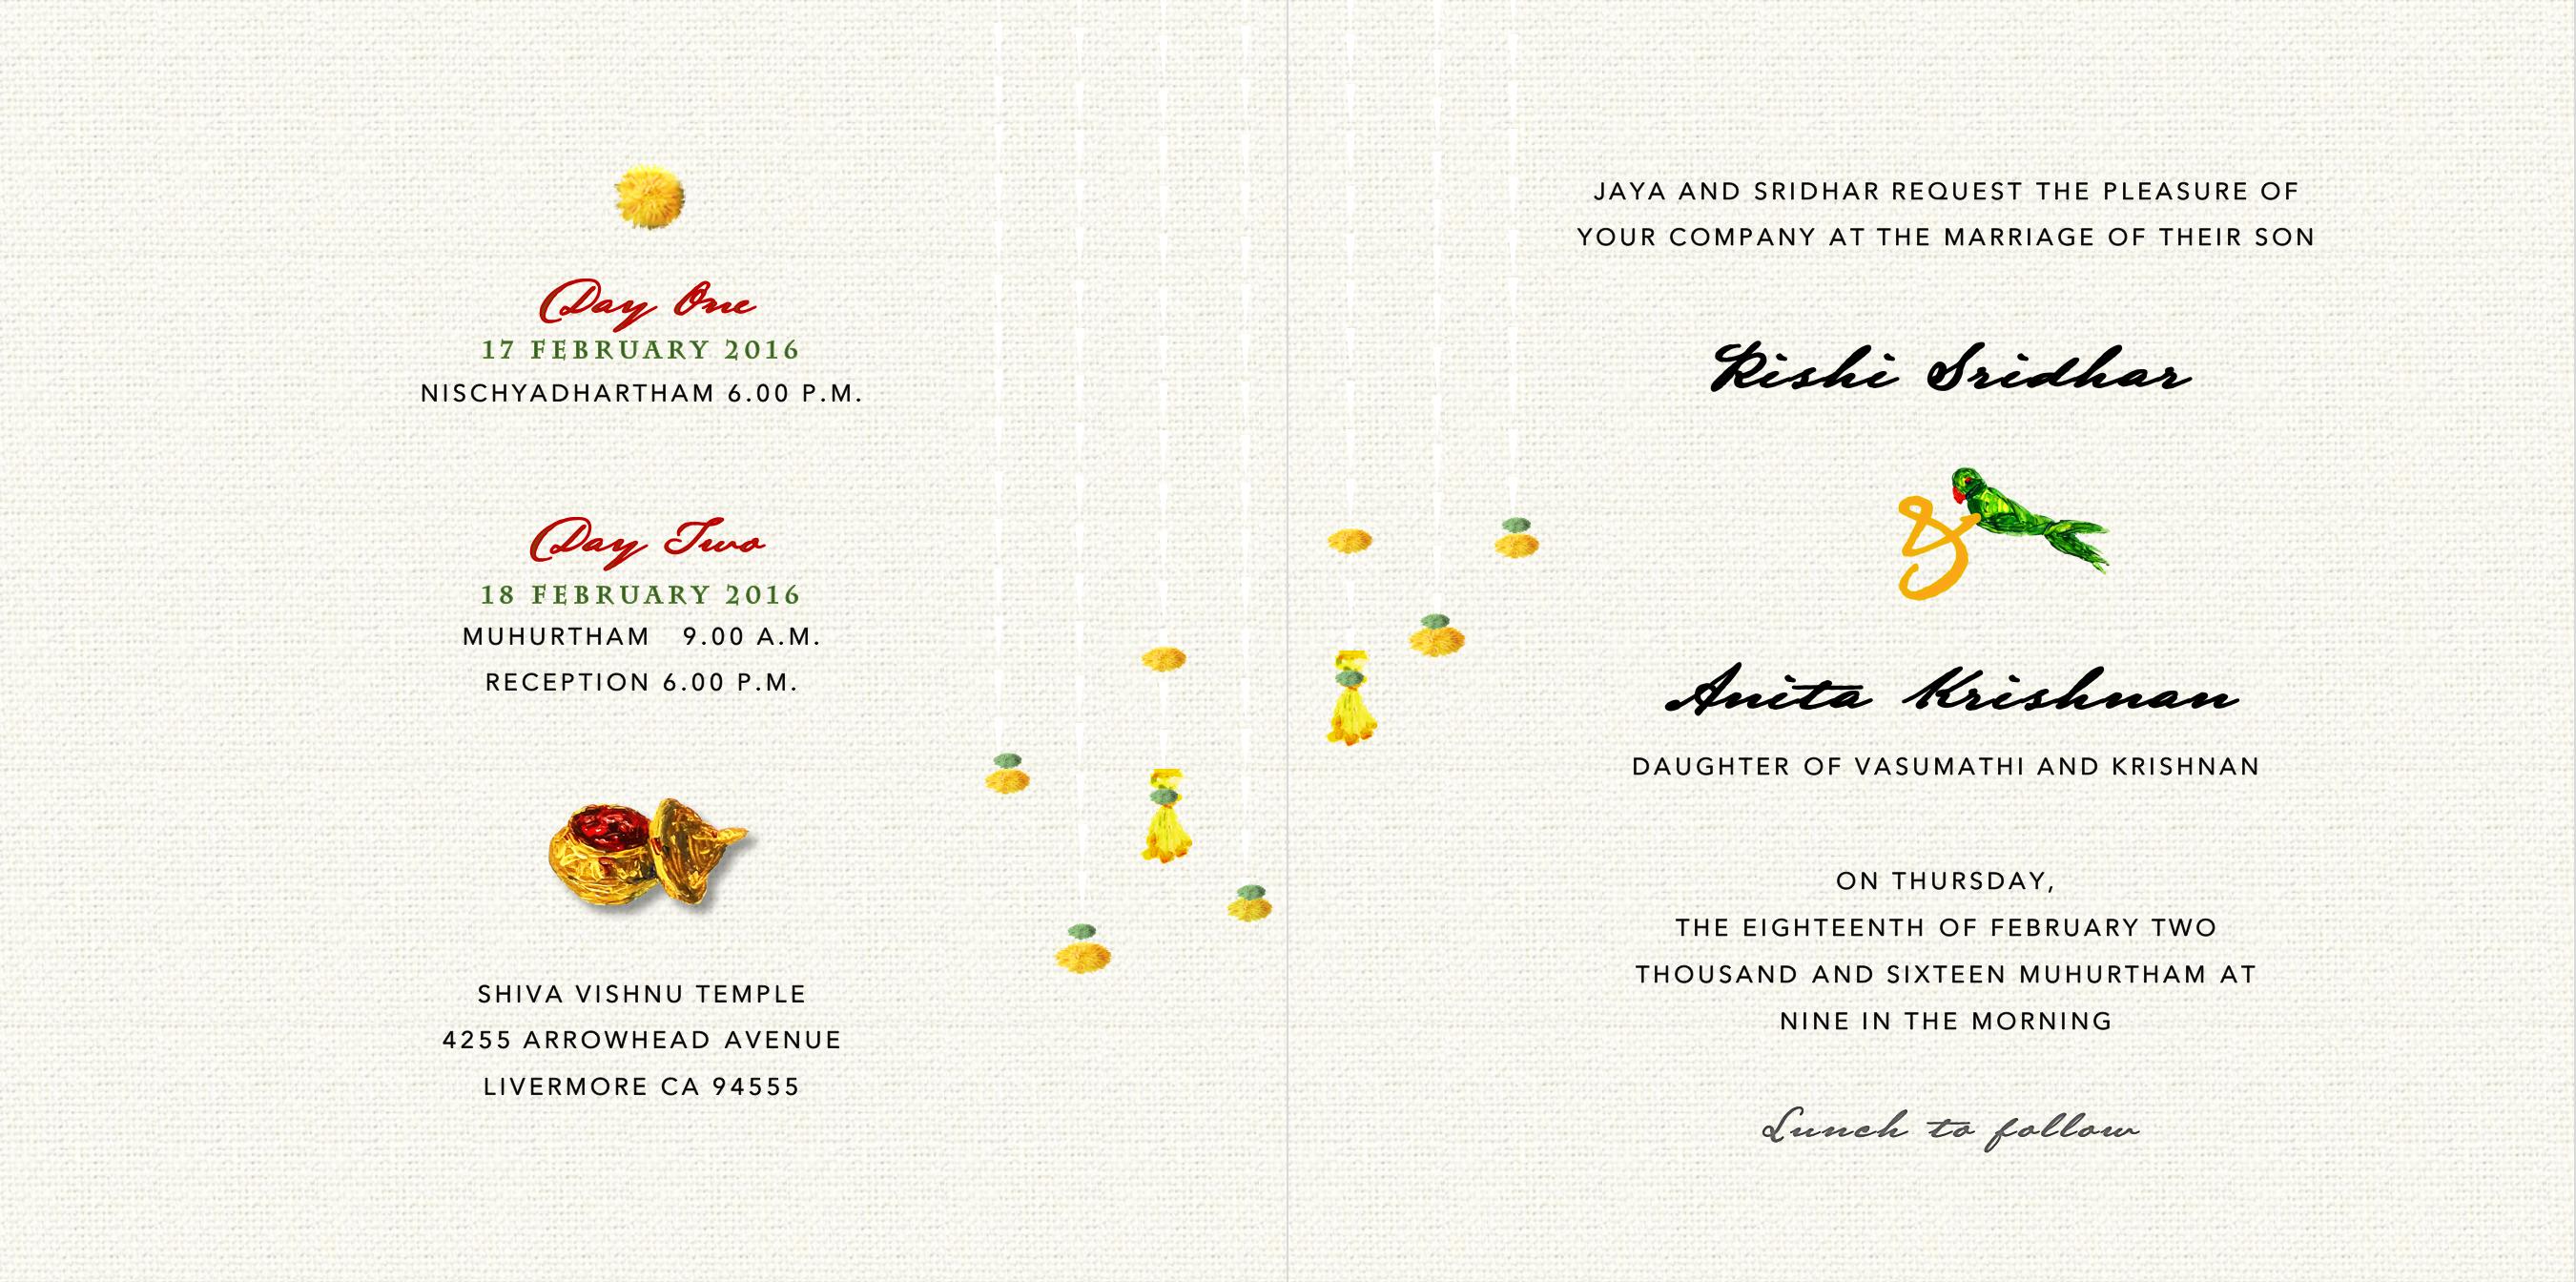 Samétha\'s South Indian Wedding Invitation Card Inside | Indian ...